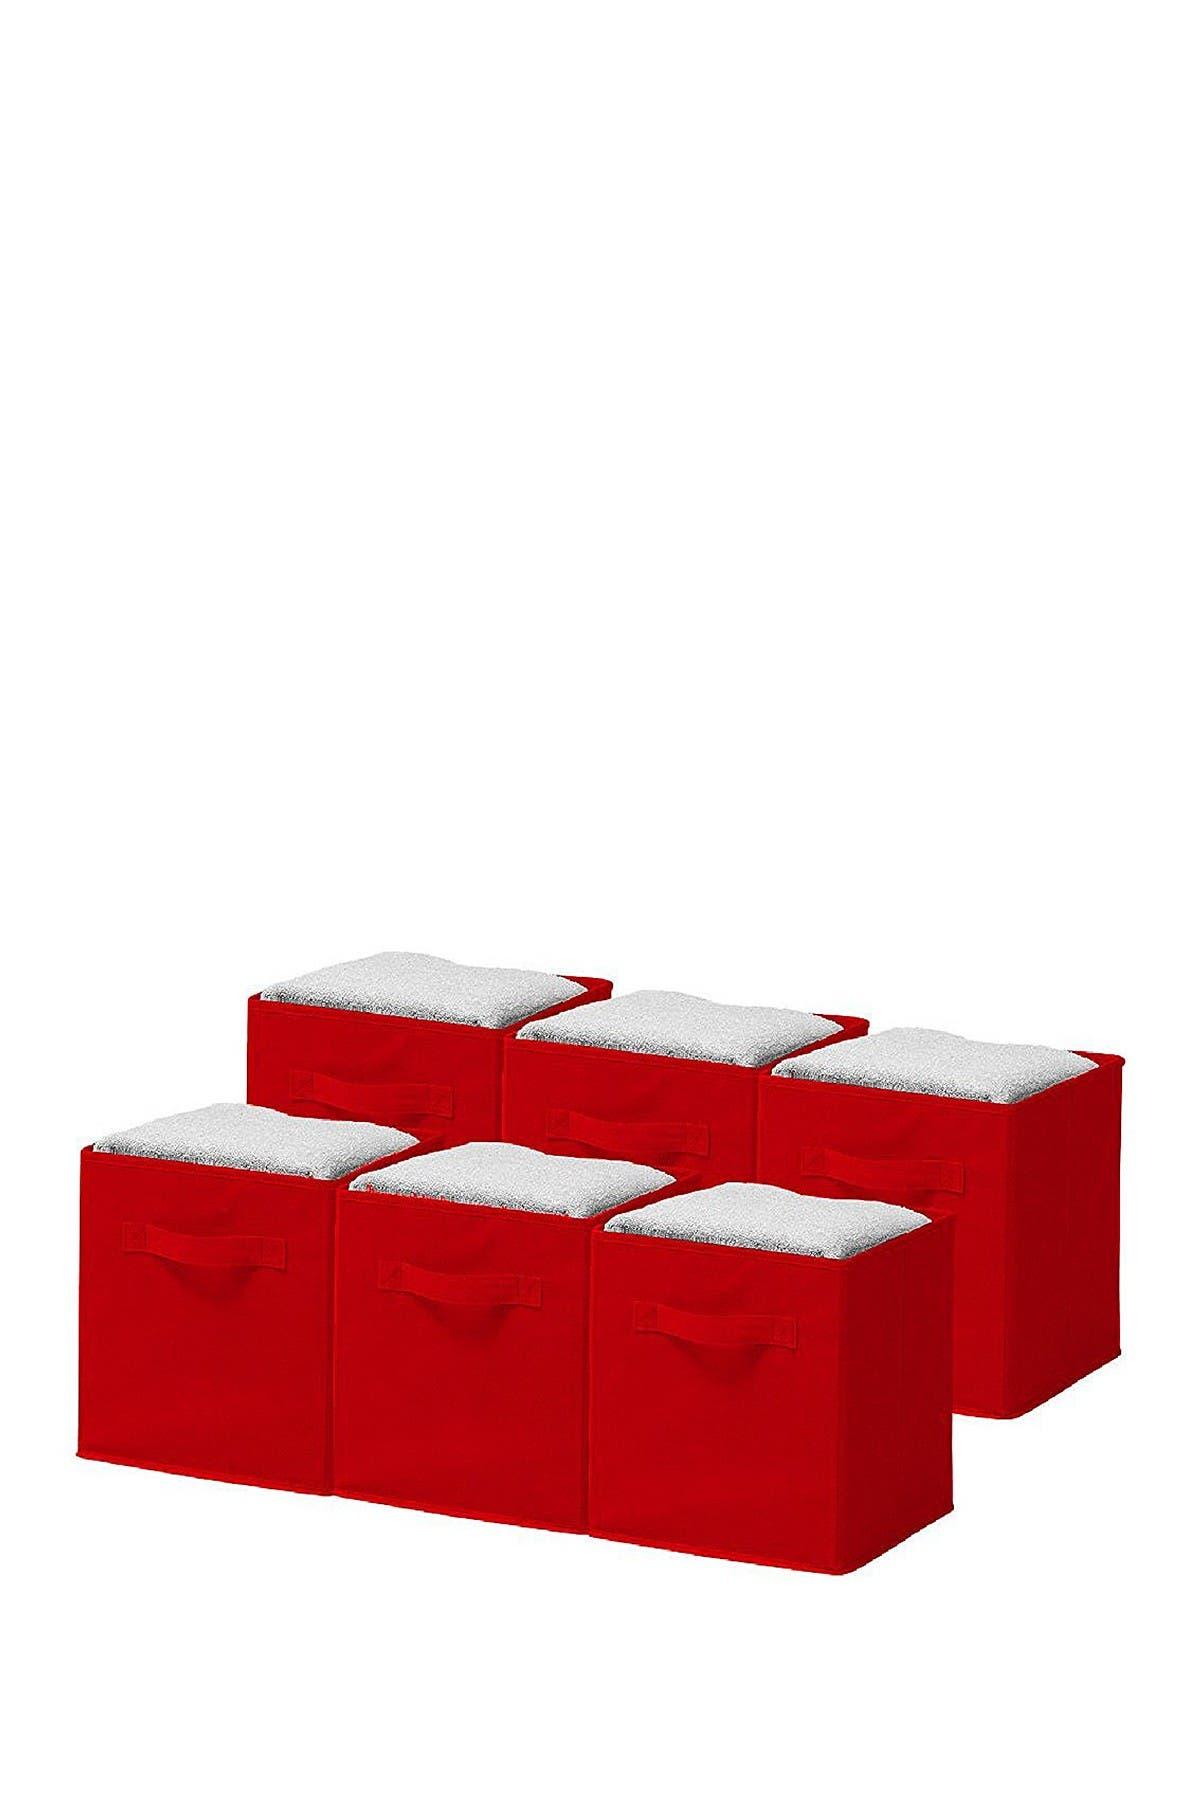 Image of Sorbus Red Foldable Storage Cube Basket Bin - Pack of 6